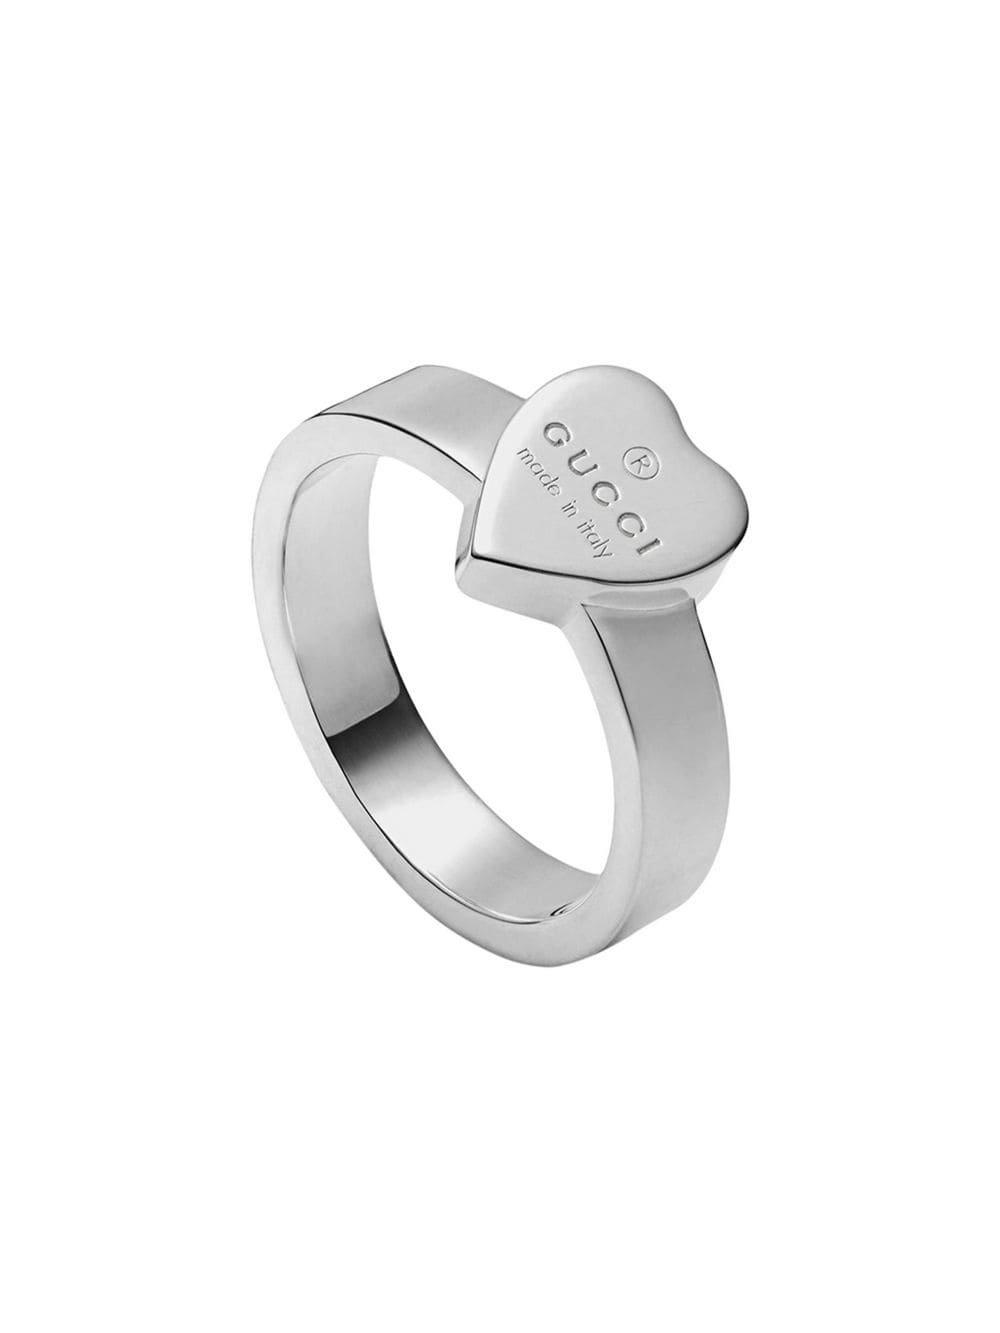 Silver Heart Ring With Gucci Trademark | Farfetch.com